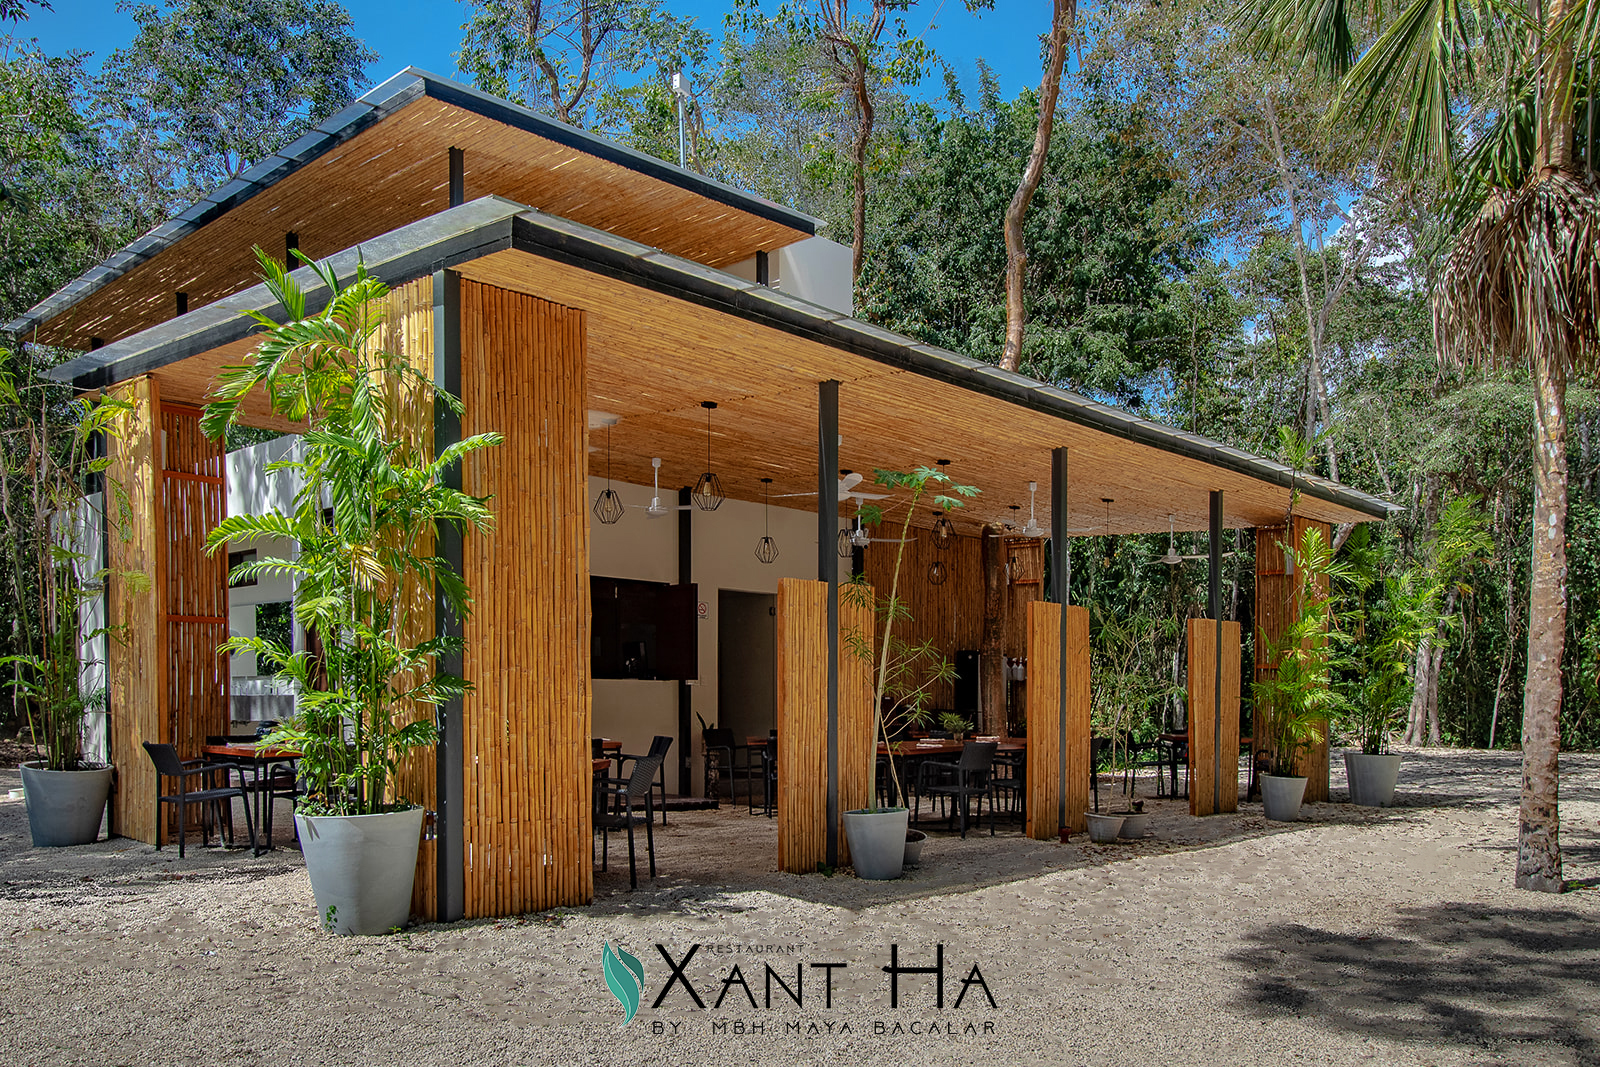 Xant-ha-Restaurante